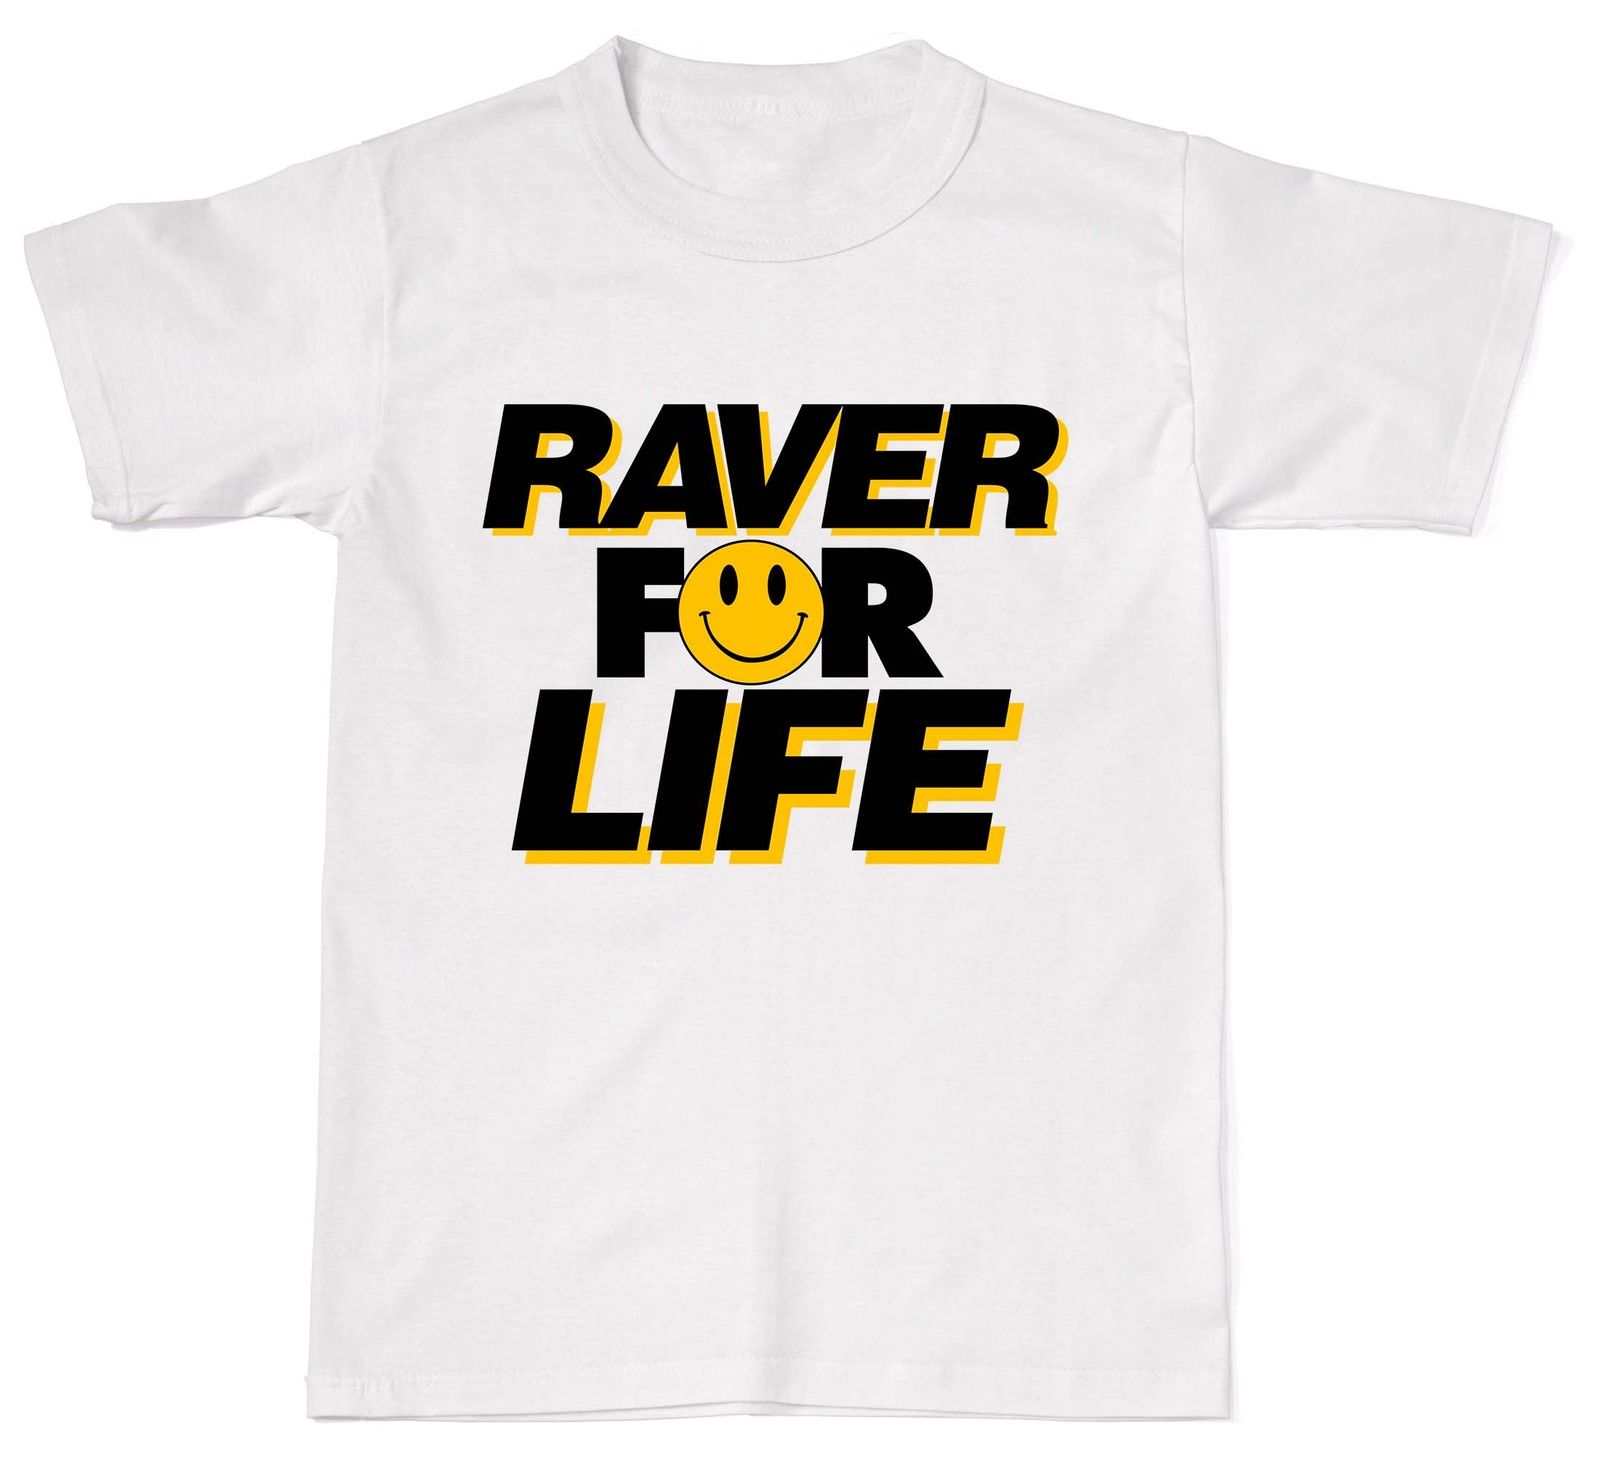 2018 Summer Fashion Hot Sale Men T Shirt Raver For Life Rave DJ Dance Acid Rave Festival Mens Womens Cotton T-Shirt T shi